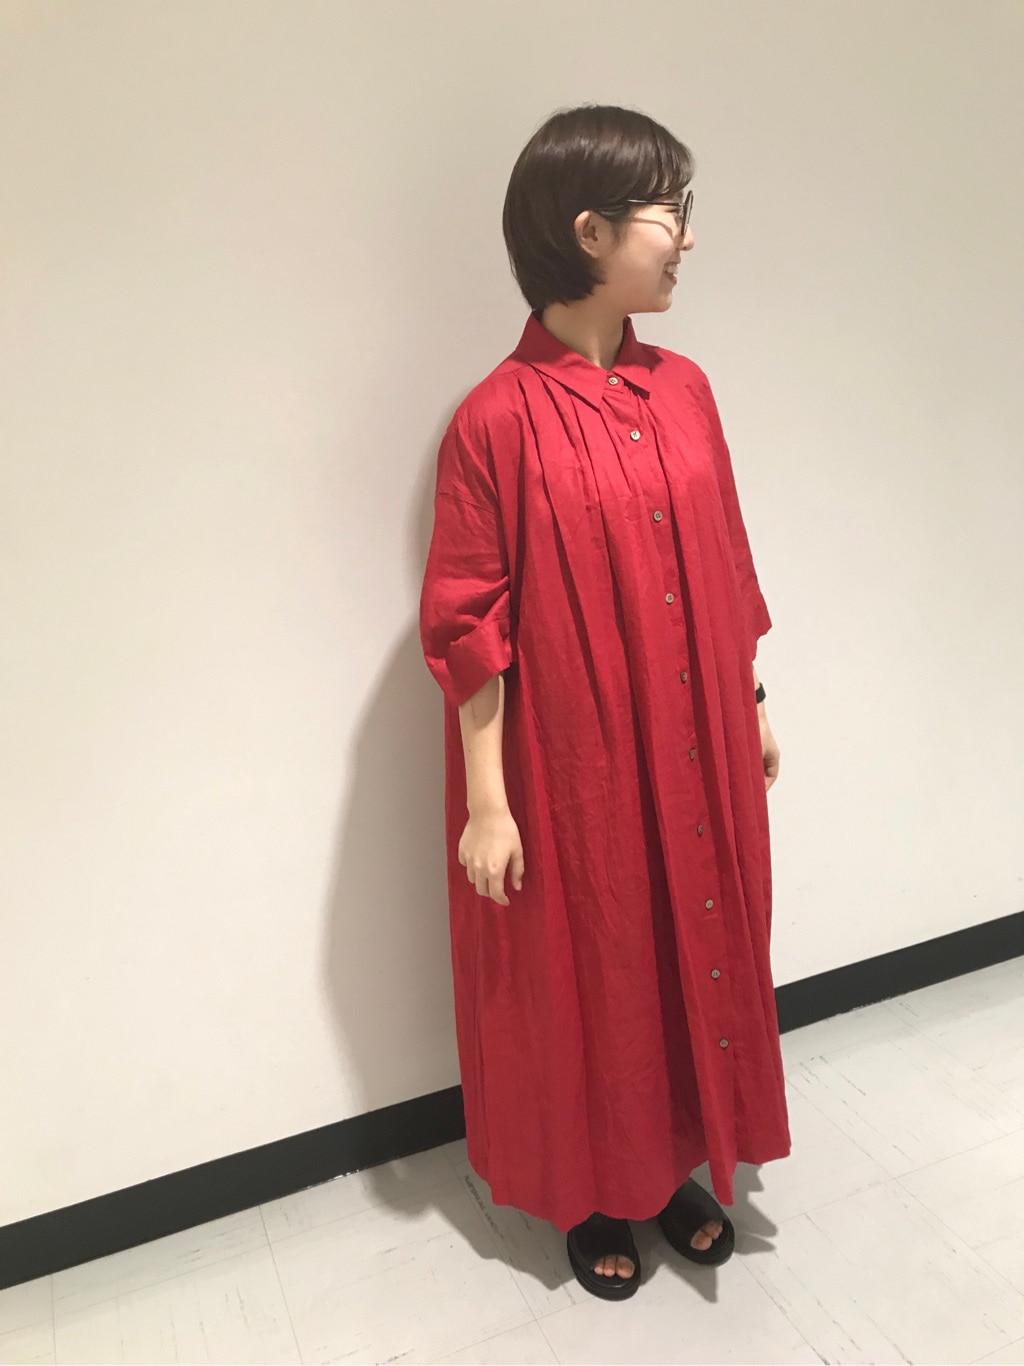 bulle de savon なんばシティ 身長:149cm 2020.03.12